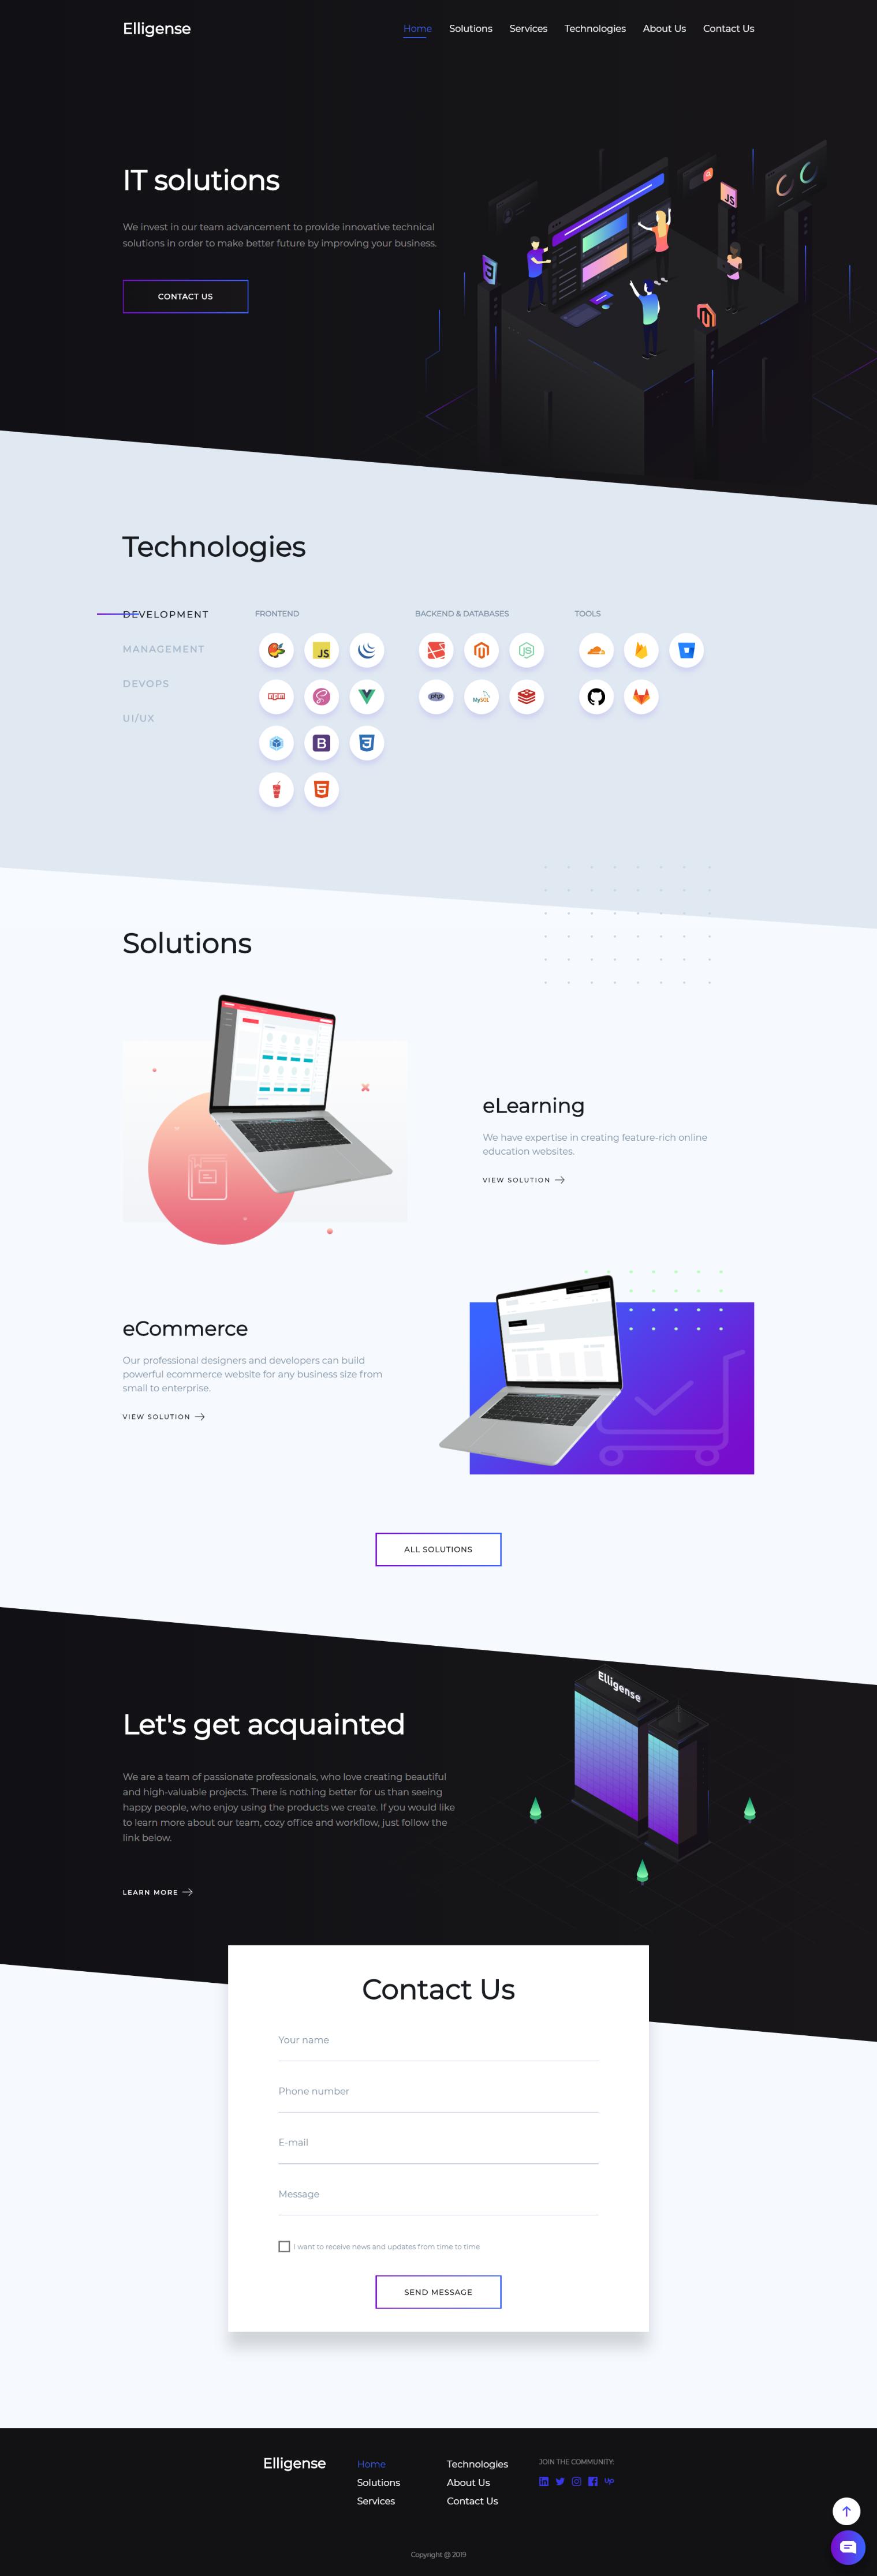 Modern Trendy And Fresh Landing Page Web Design Of Software Development Company Inspiration Idea In 2020 Corporate Website Design Web Design Business Web Design